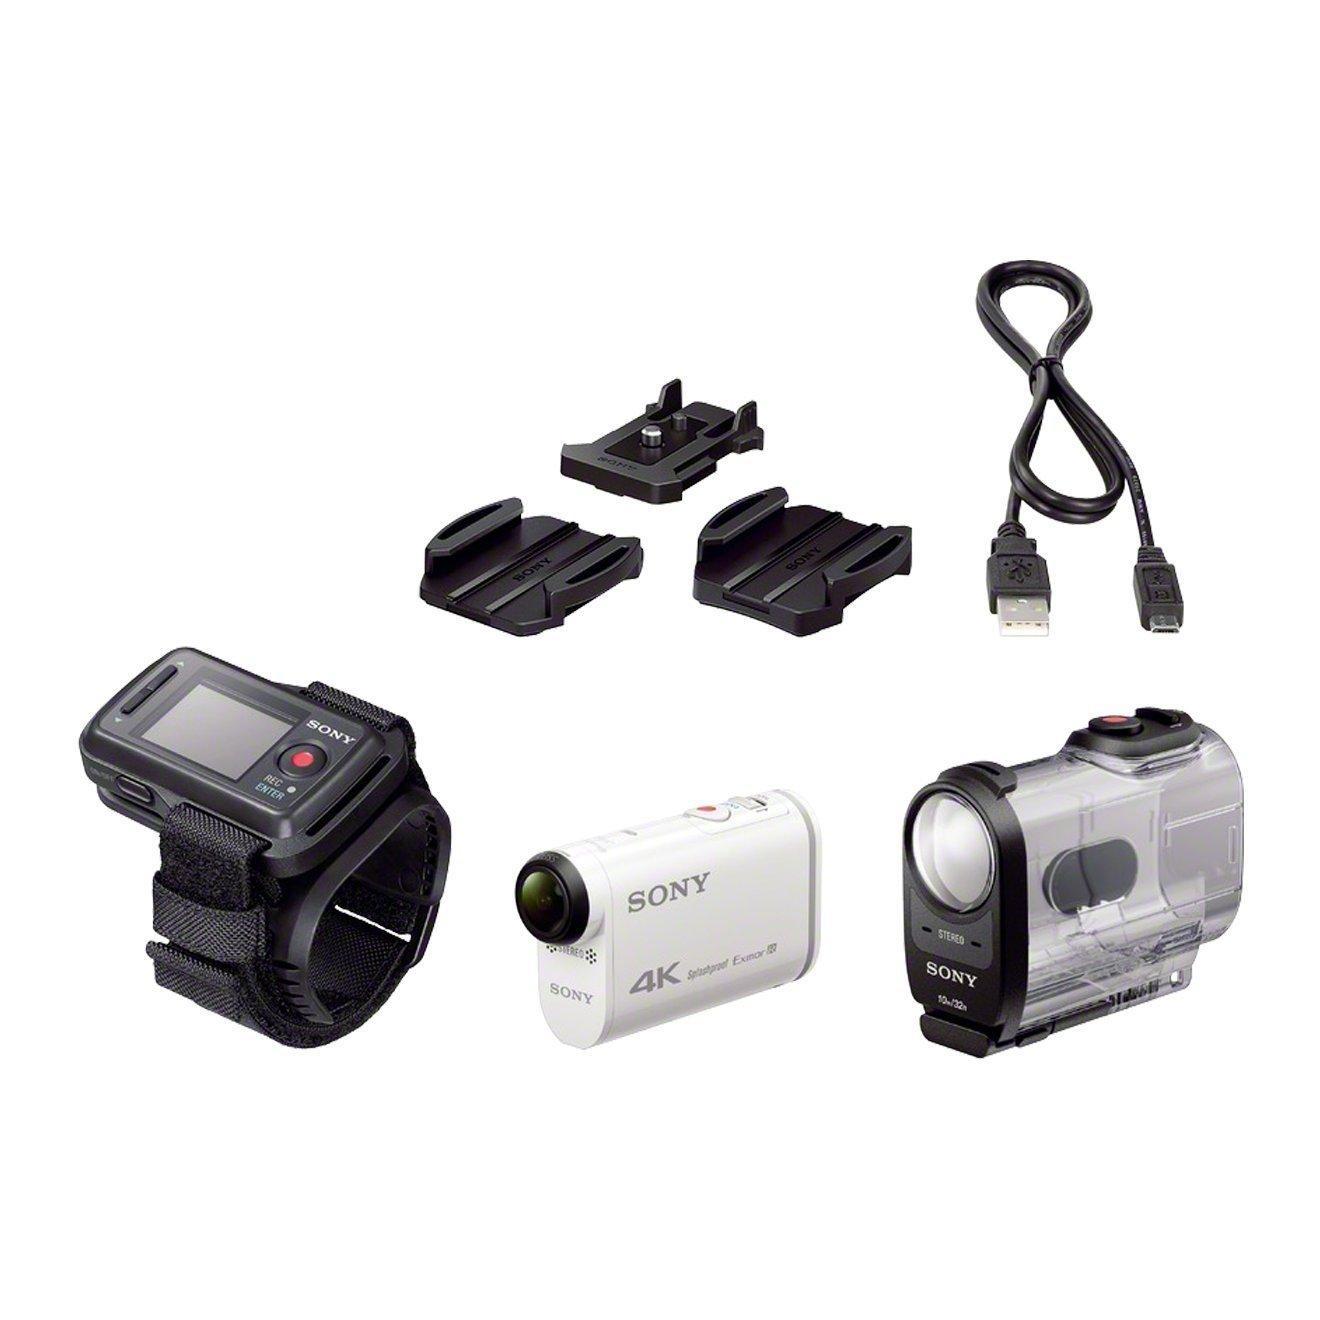 Caméra sportive Sony FDR-X1000VR Remote Edition (avec montre incluse)